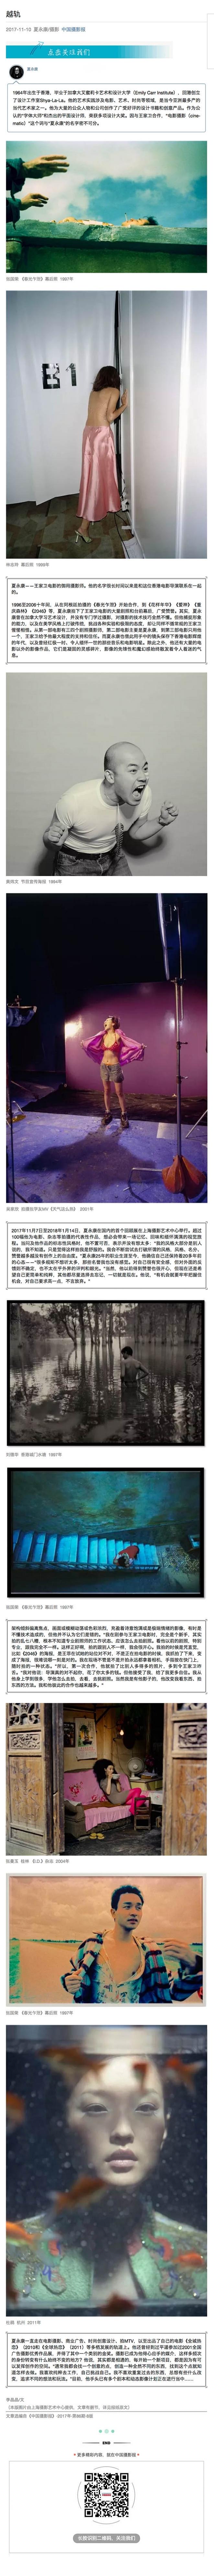 China Photo Press Online_WingShya_171110.jpg